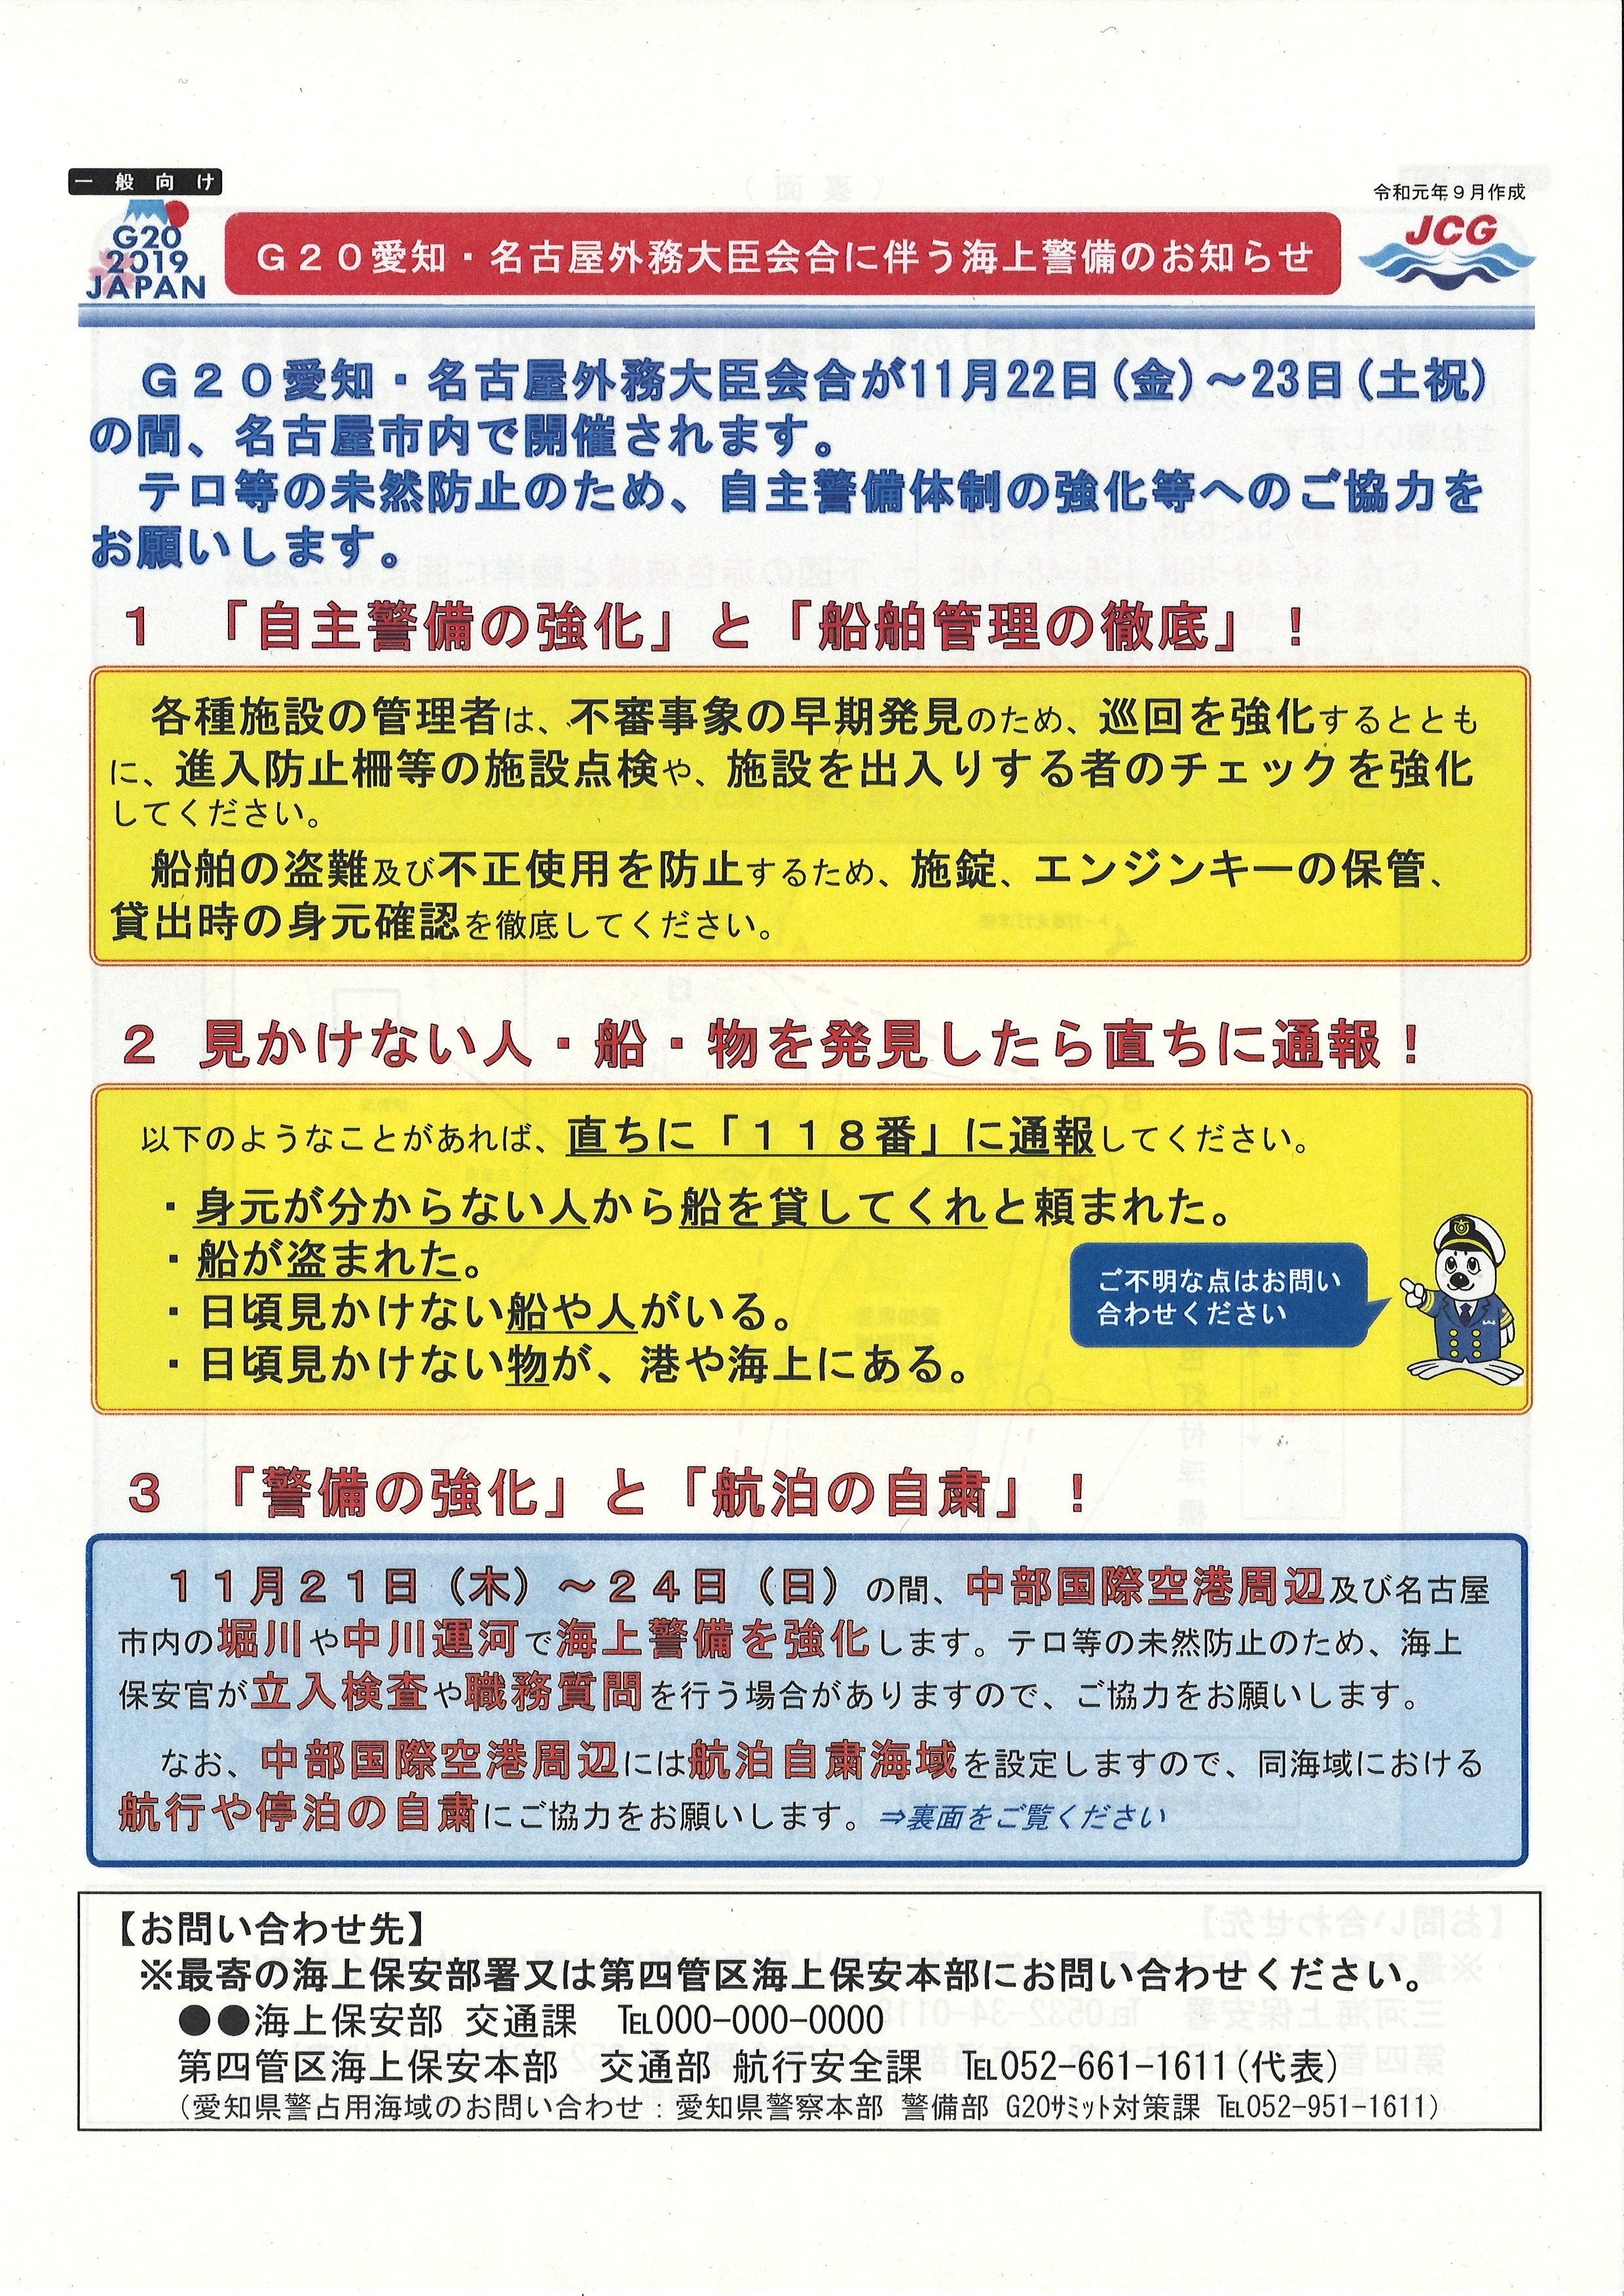 G20愛知・名古屋外務大臣会合に伴う海上警備のお知らせ